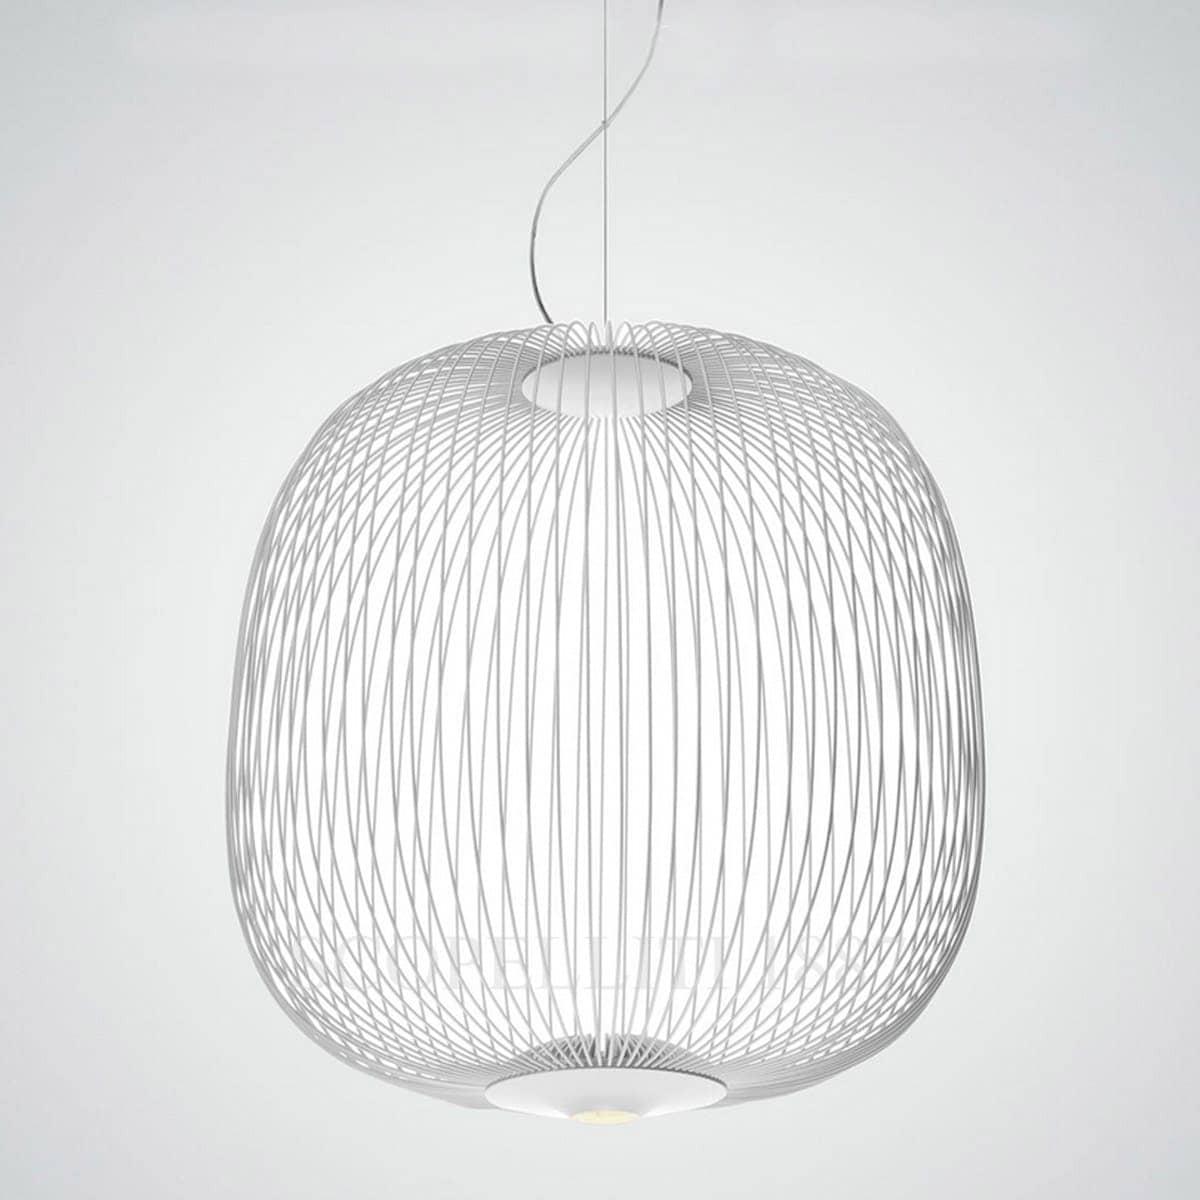 Foscarini Spokes 2 suspension Lamp